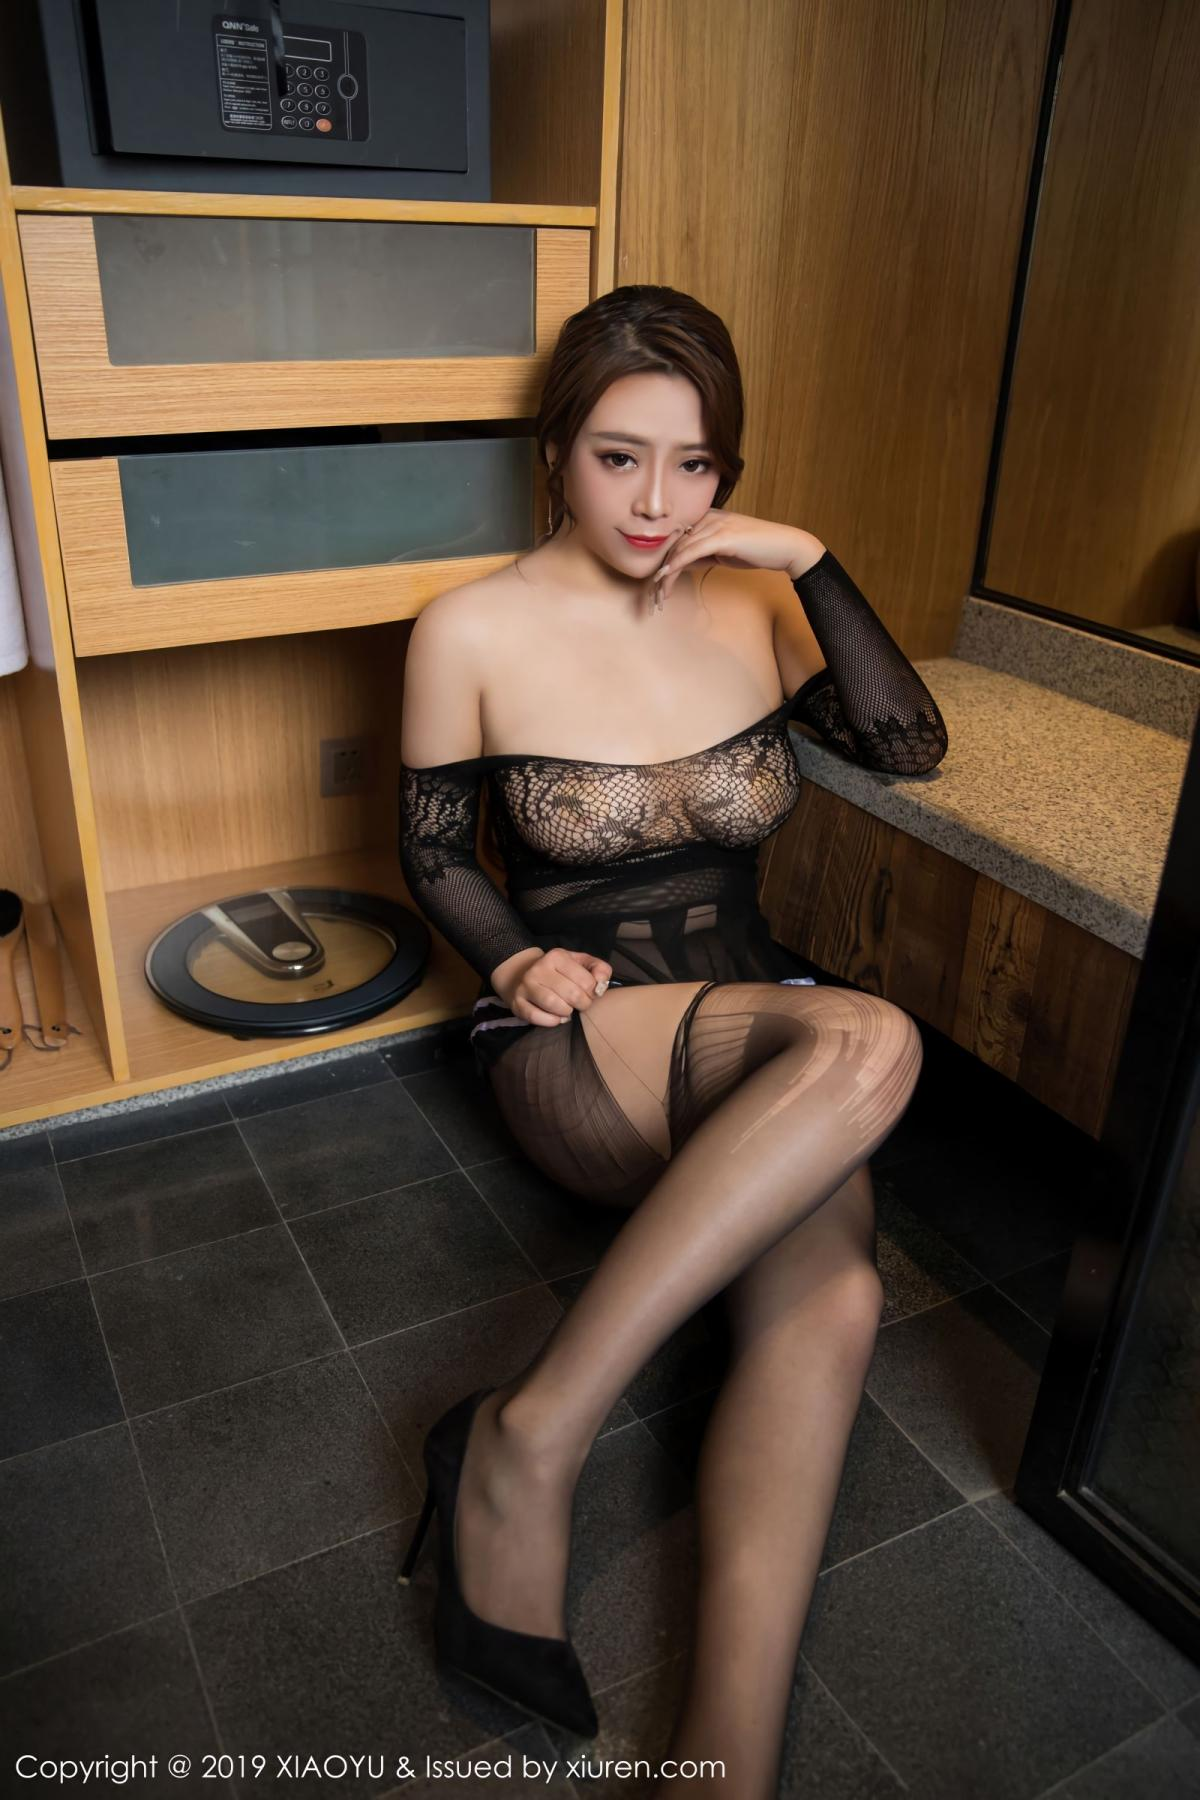 [XiaoYu] Vol.016 Miki Tu 30P, Miki Tu, Tall, XiaoYu